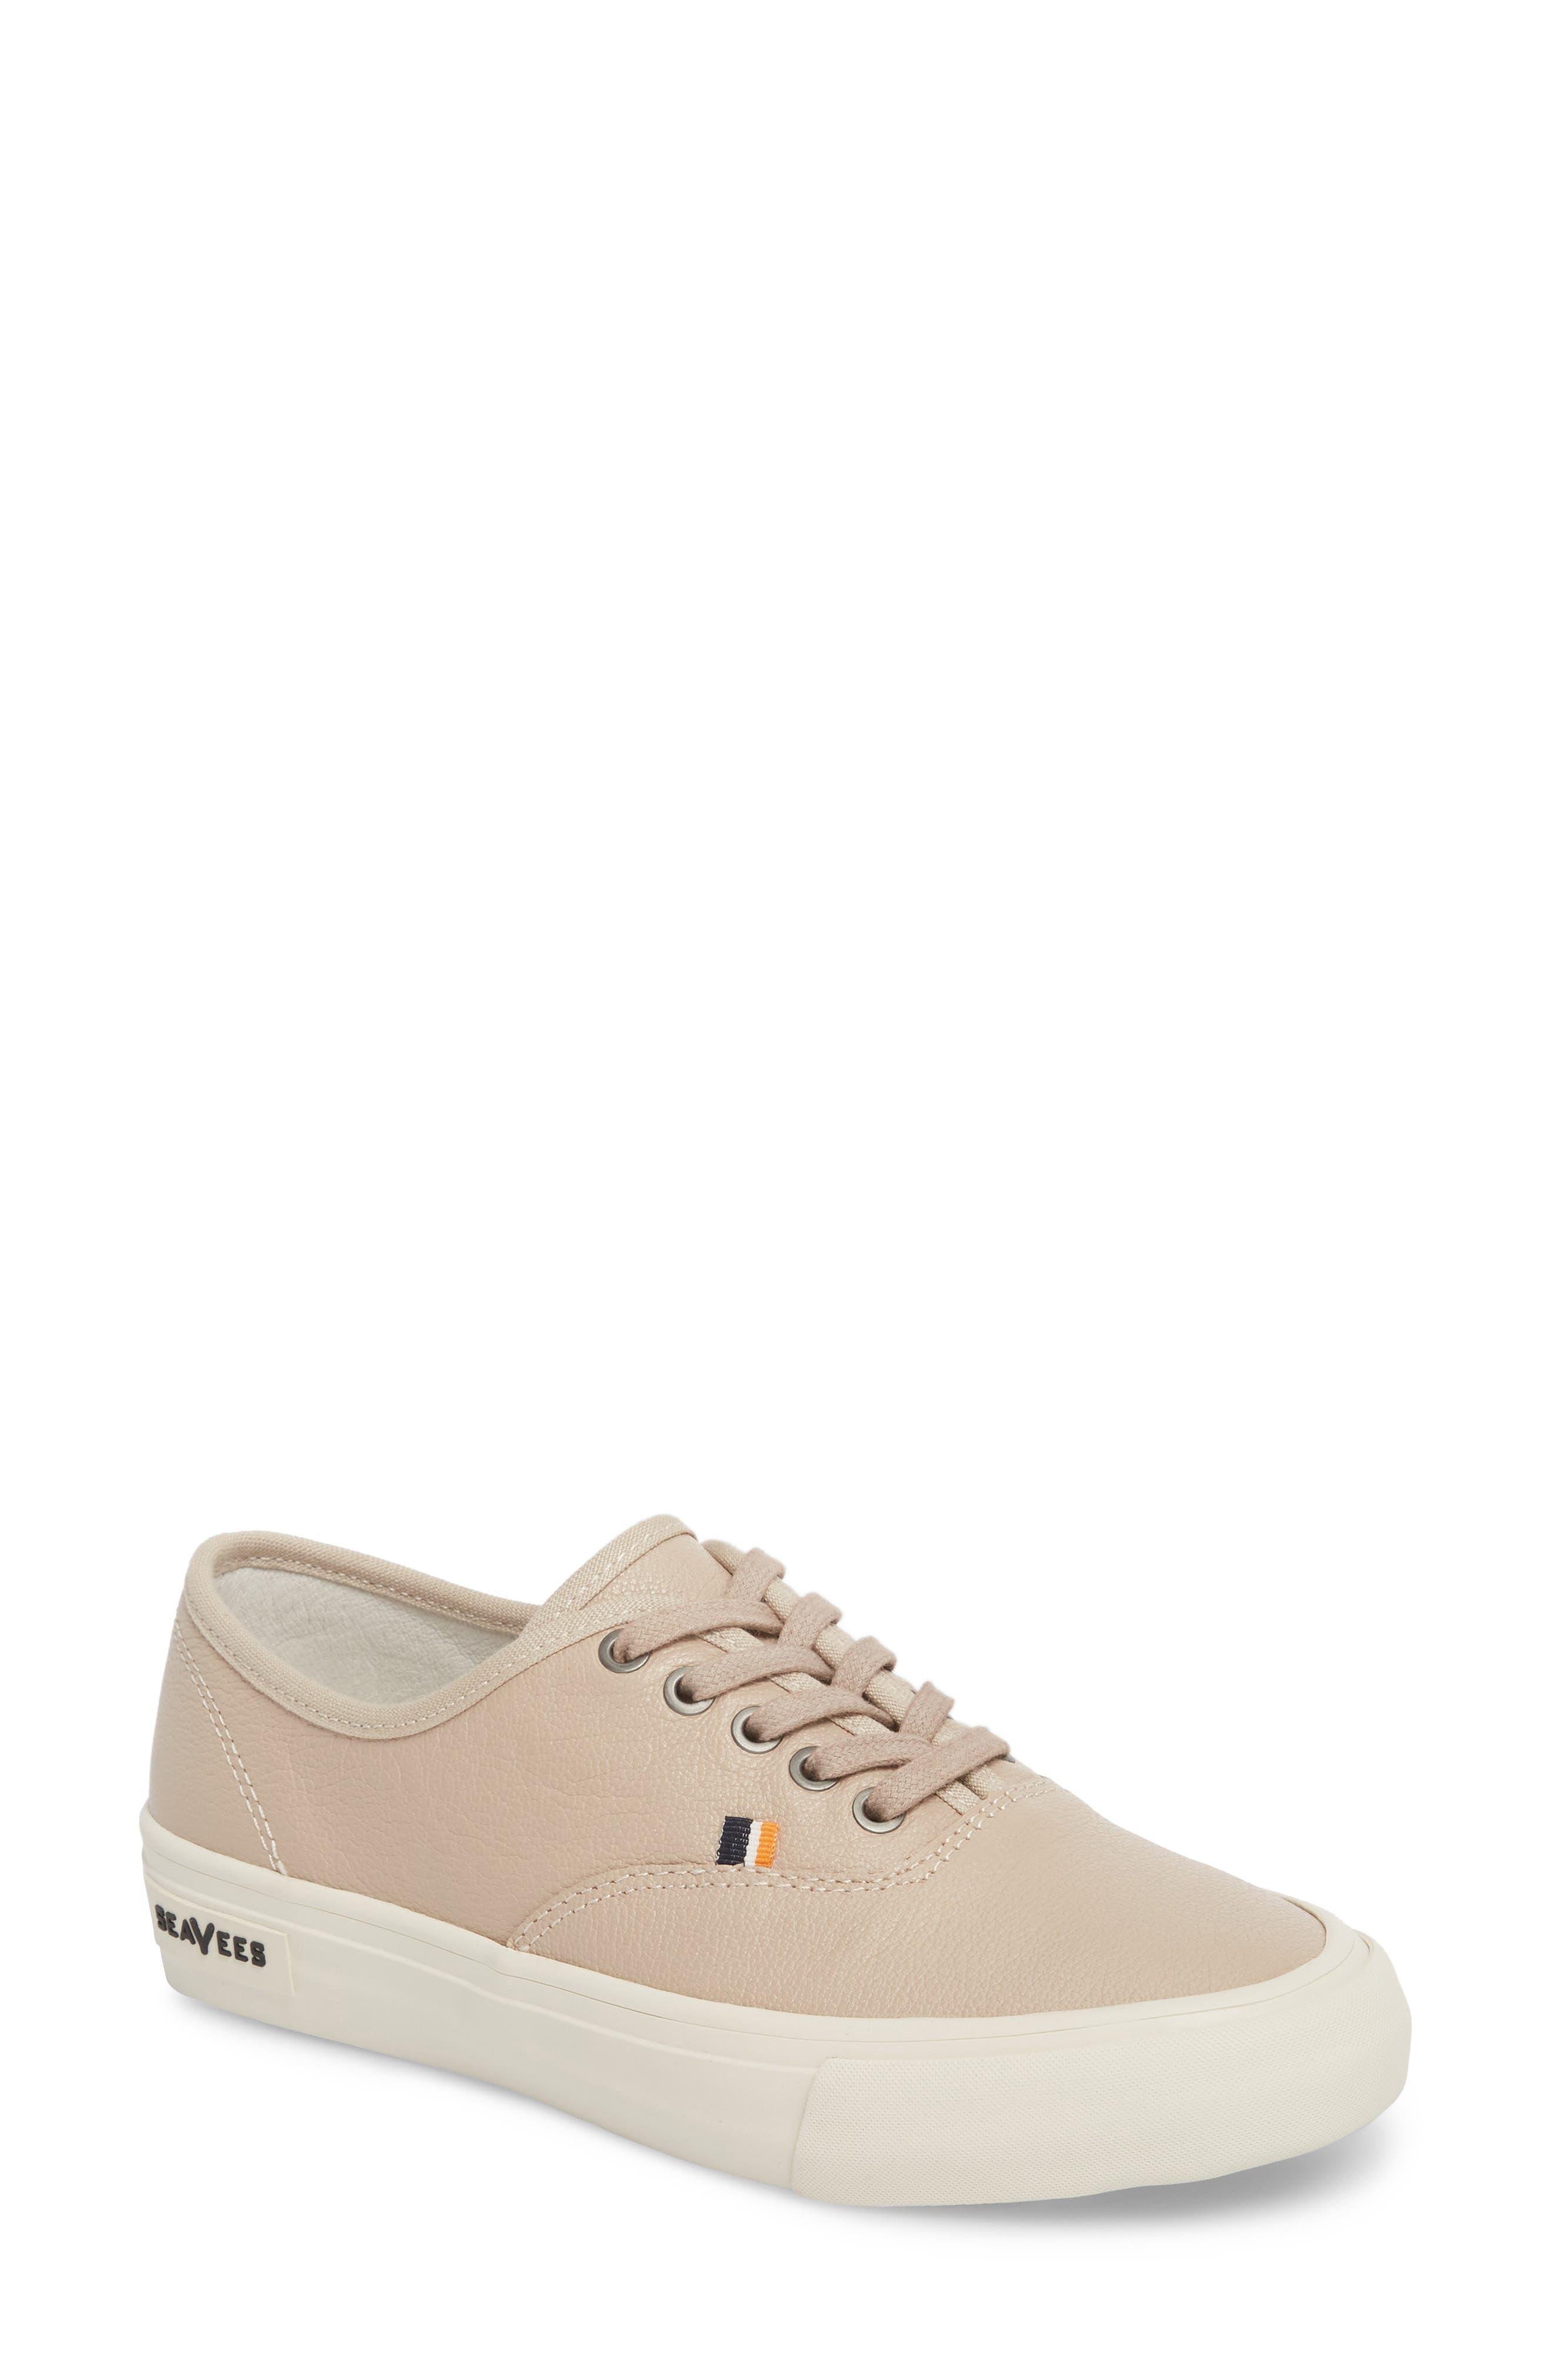 x Derek Lam 10 Crosby Legend Caballero Sneaker,                         Main,                         color, Bisque